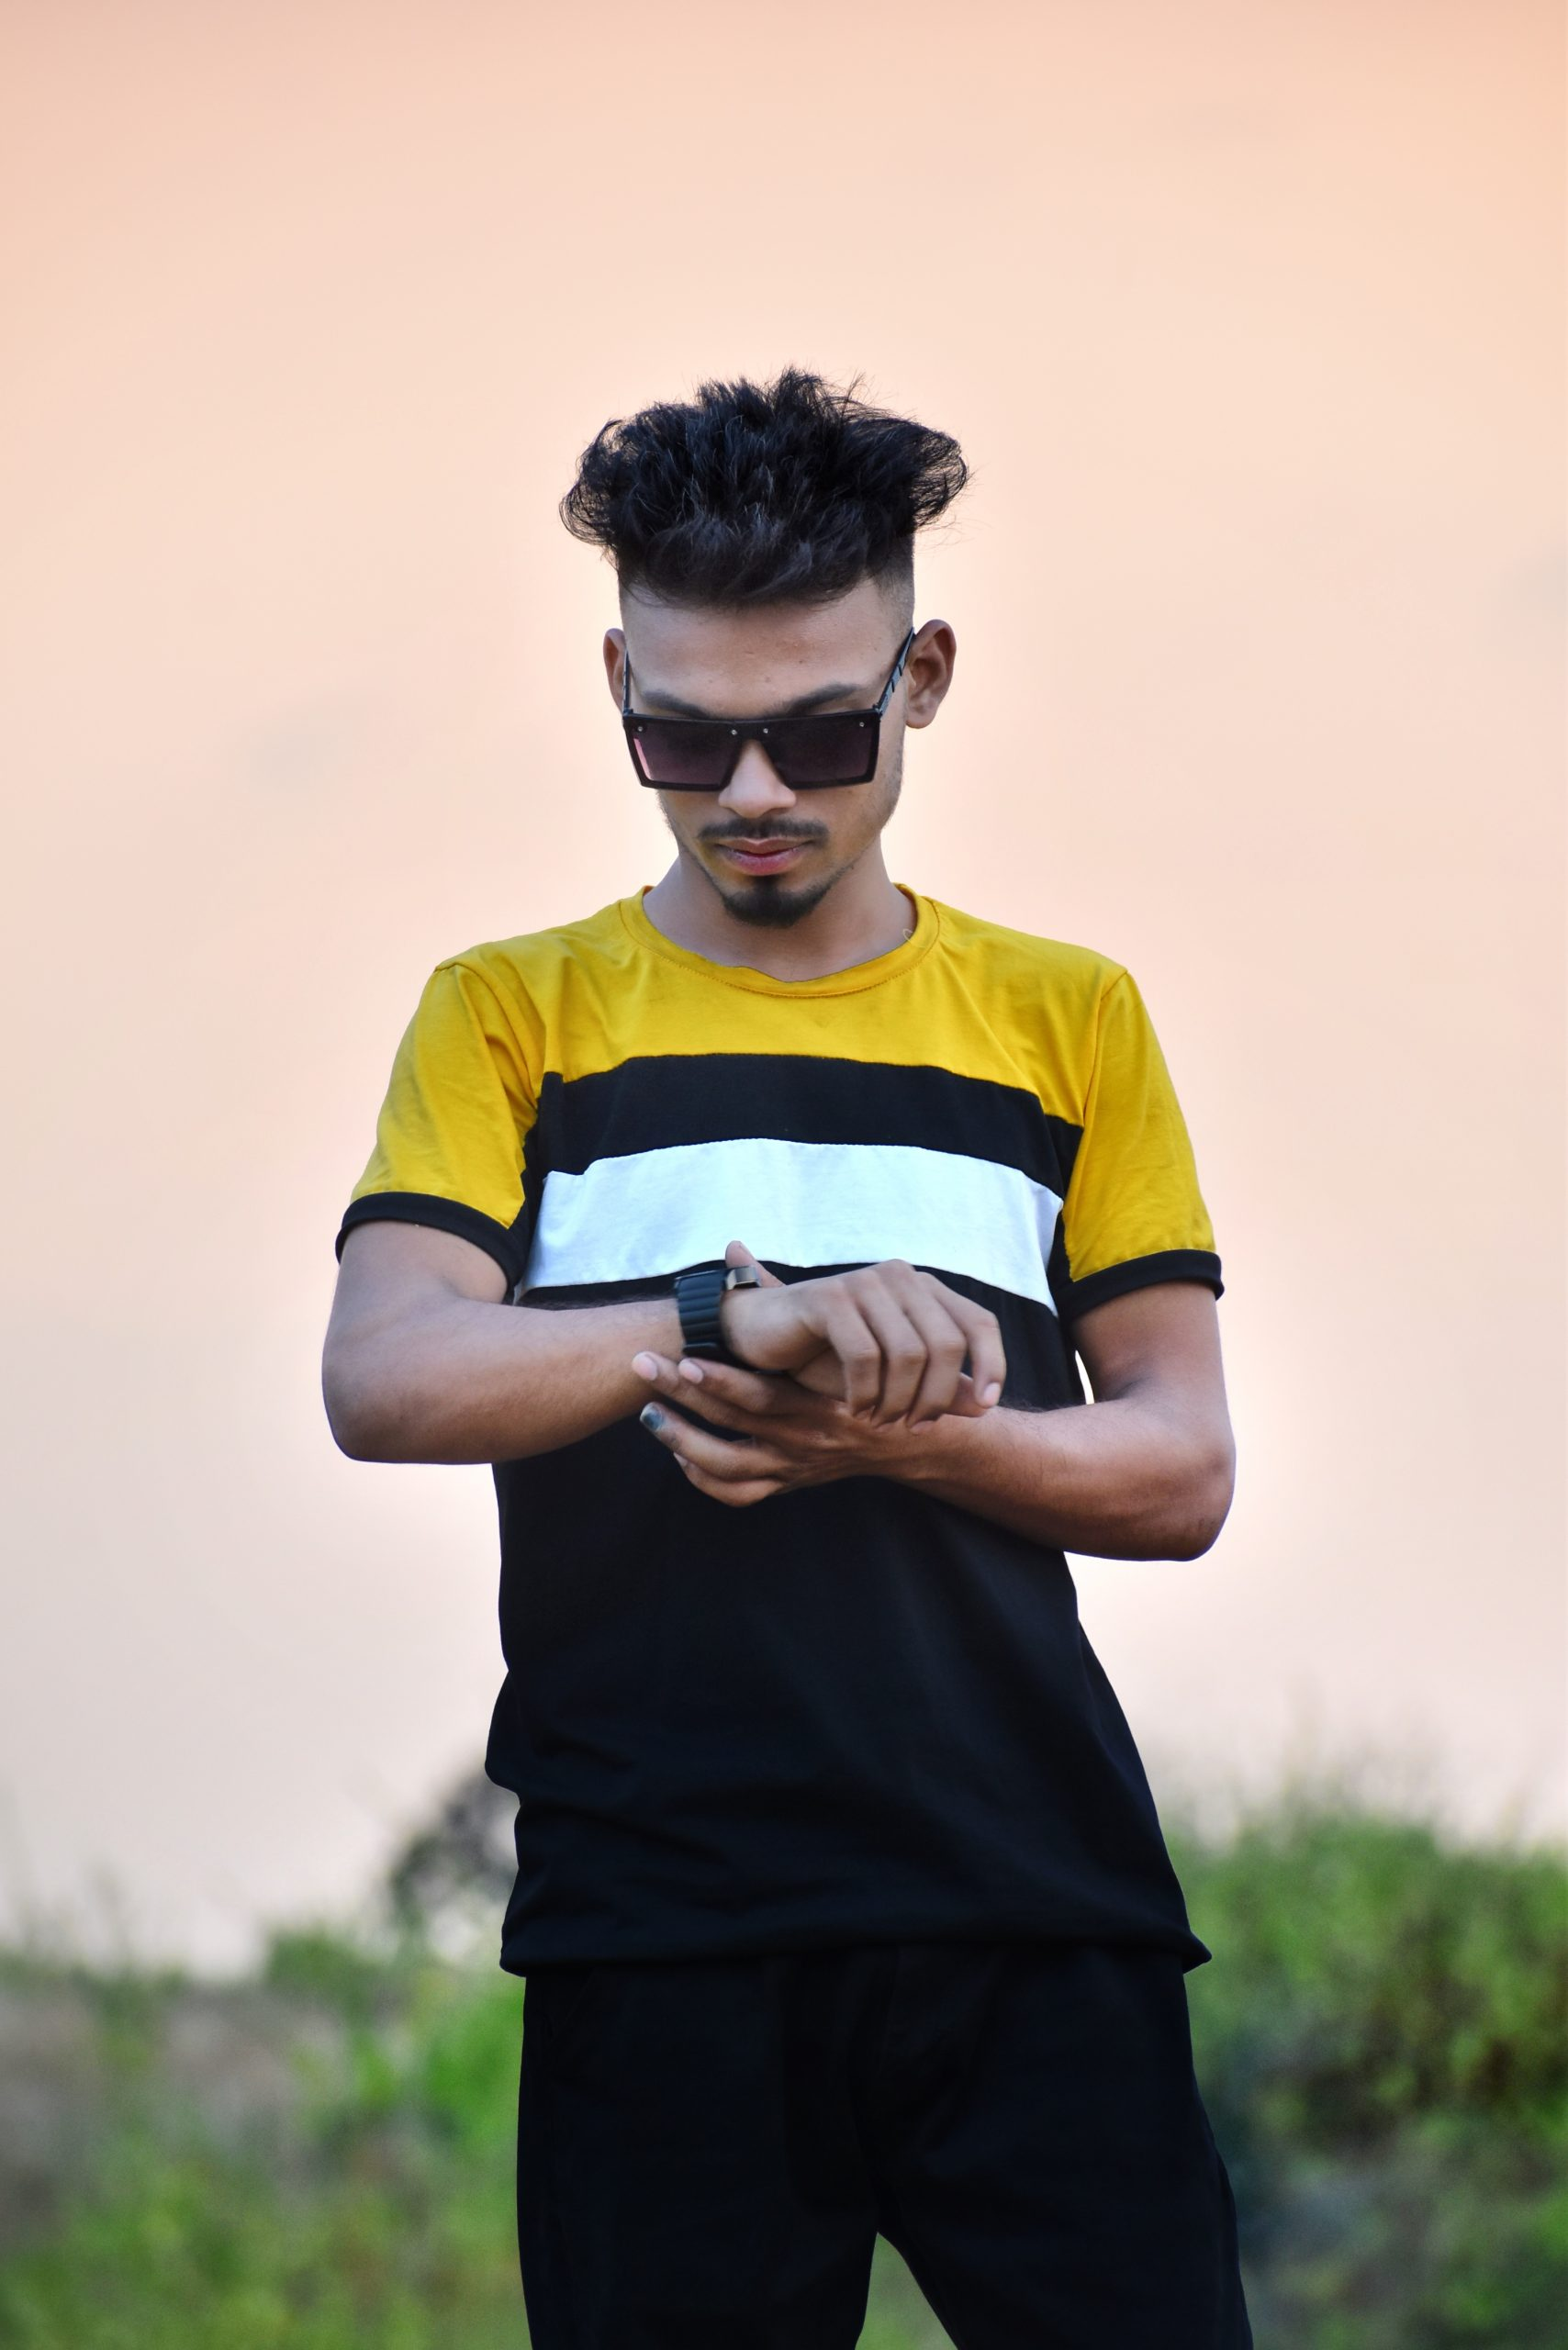 Boy posing with watch